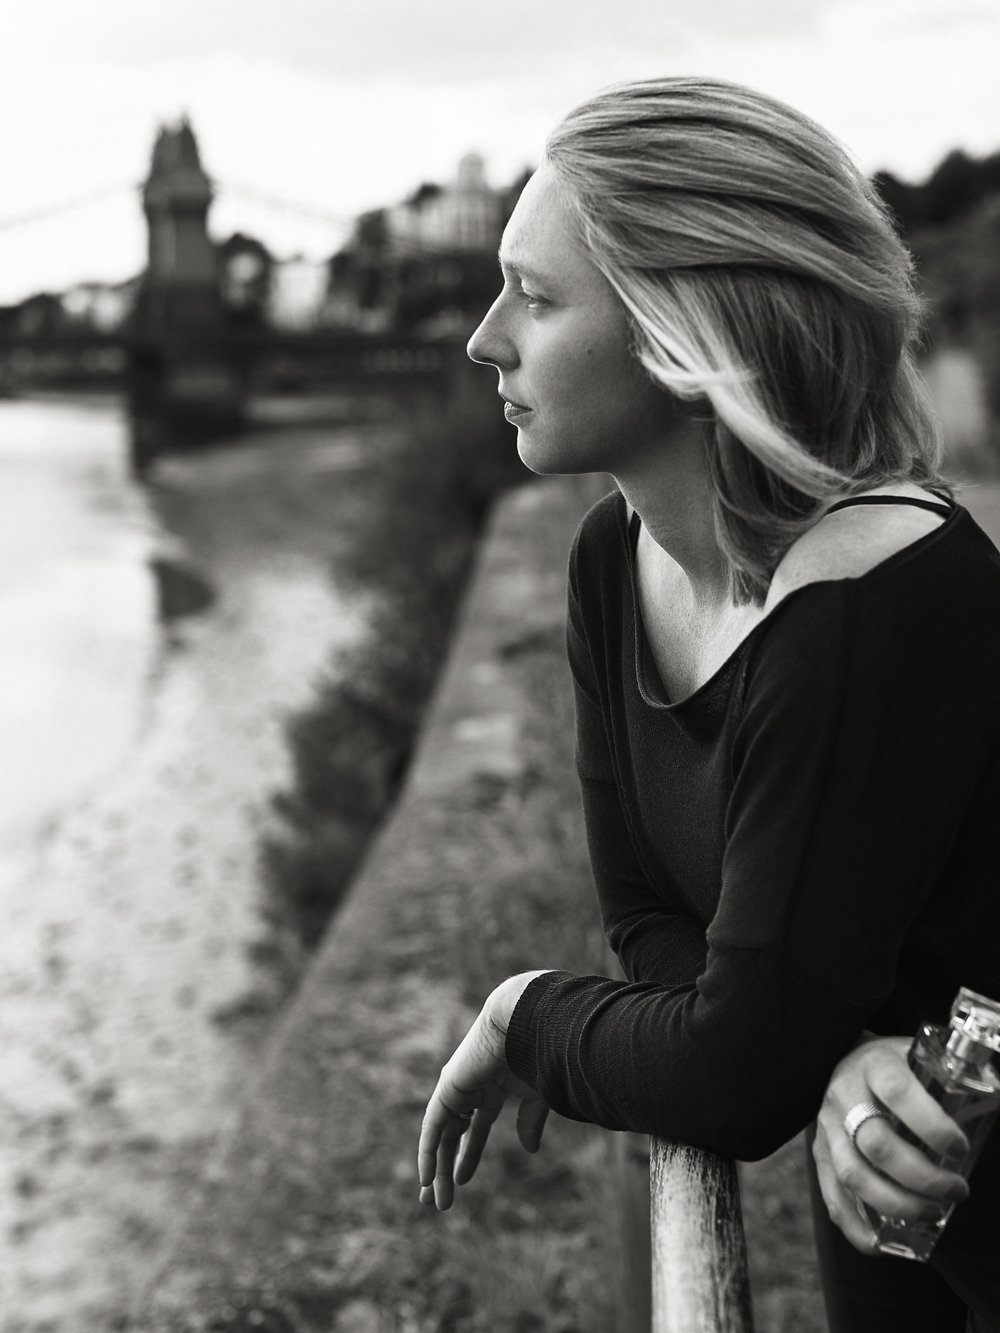 Nina-Friede-by-Bart-Pajak-02.jpg